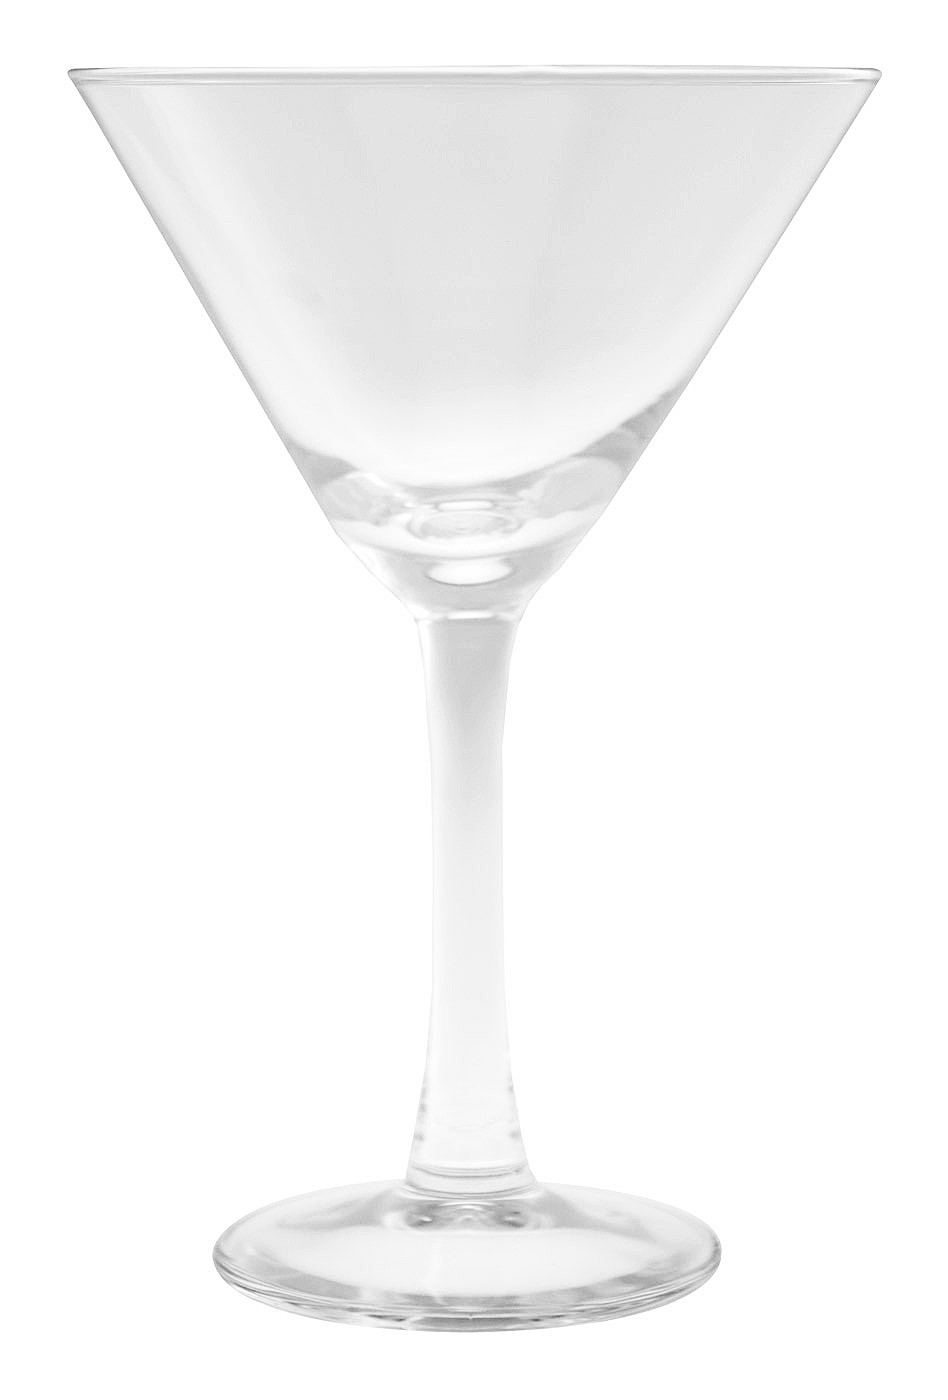 Noleggio Coppa Martini